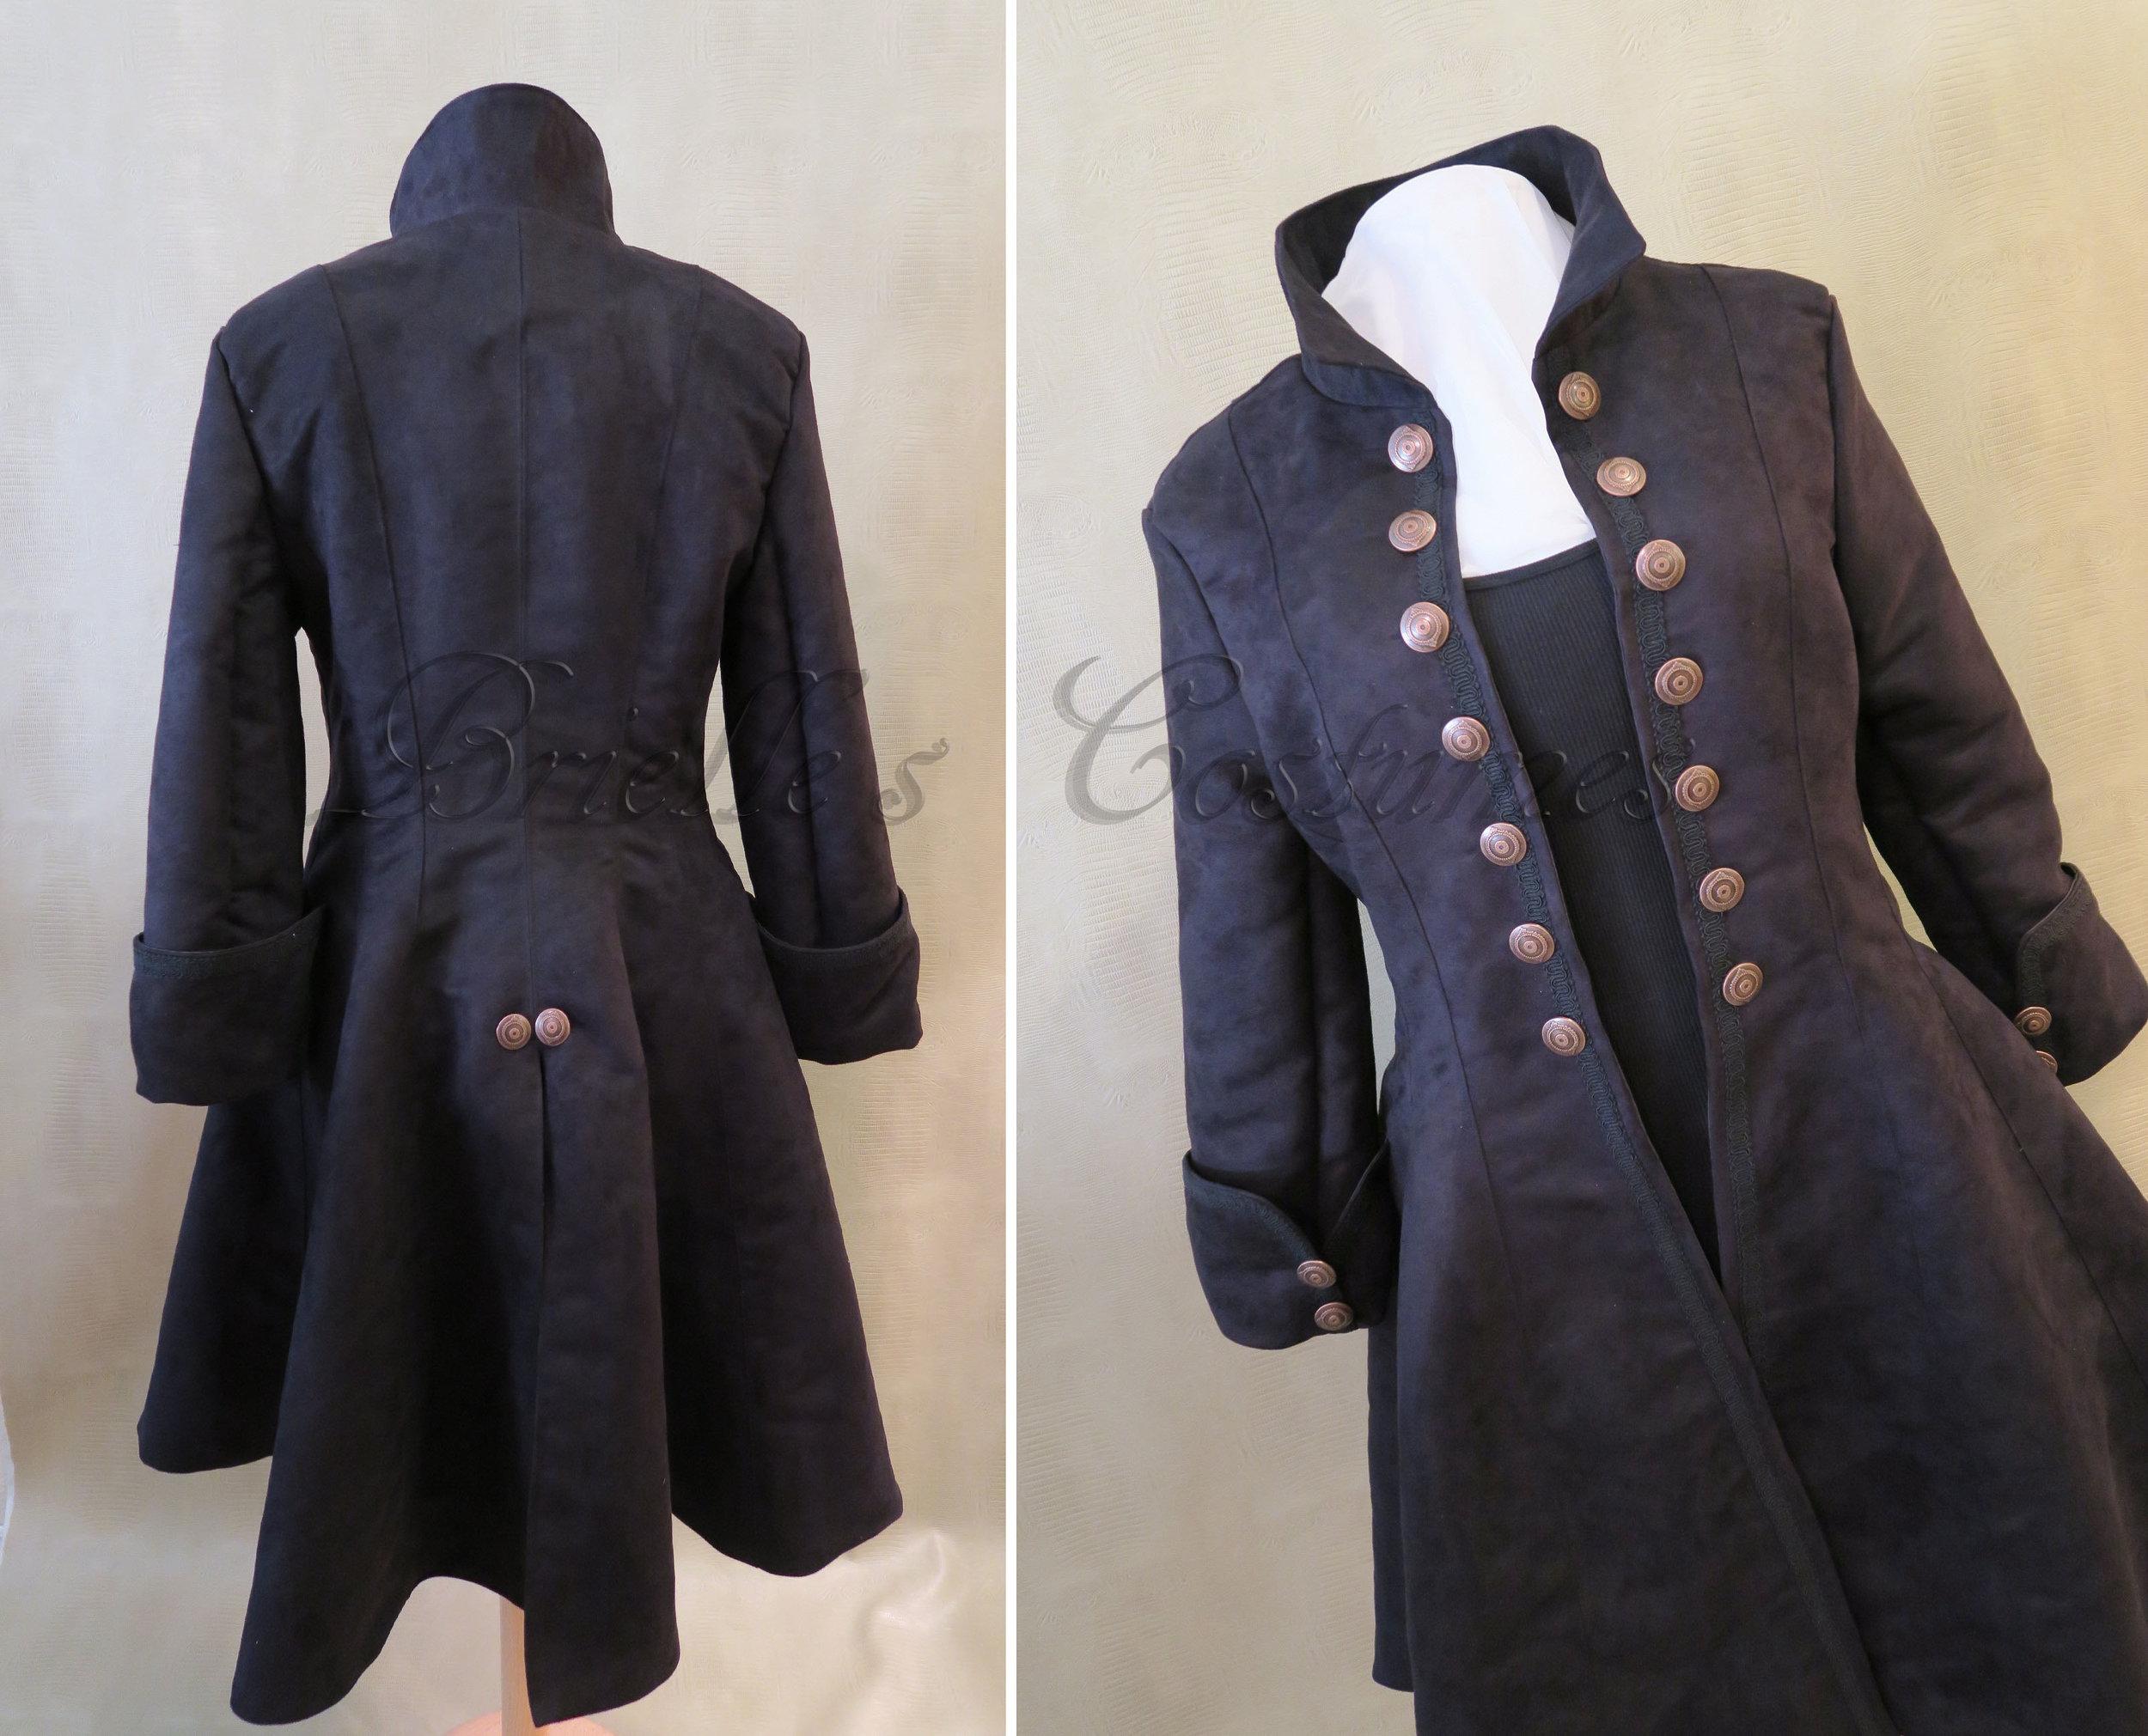 Pirate Coat2.JPG